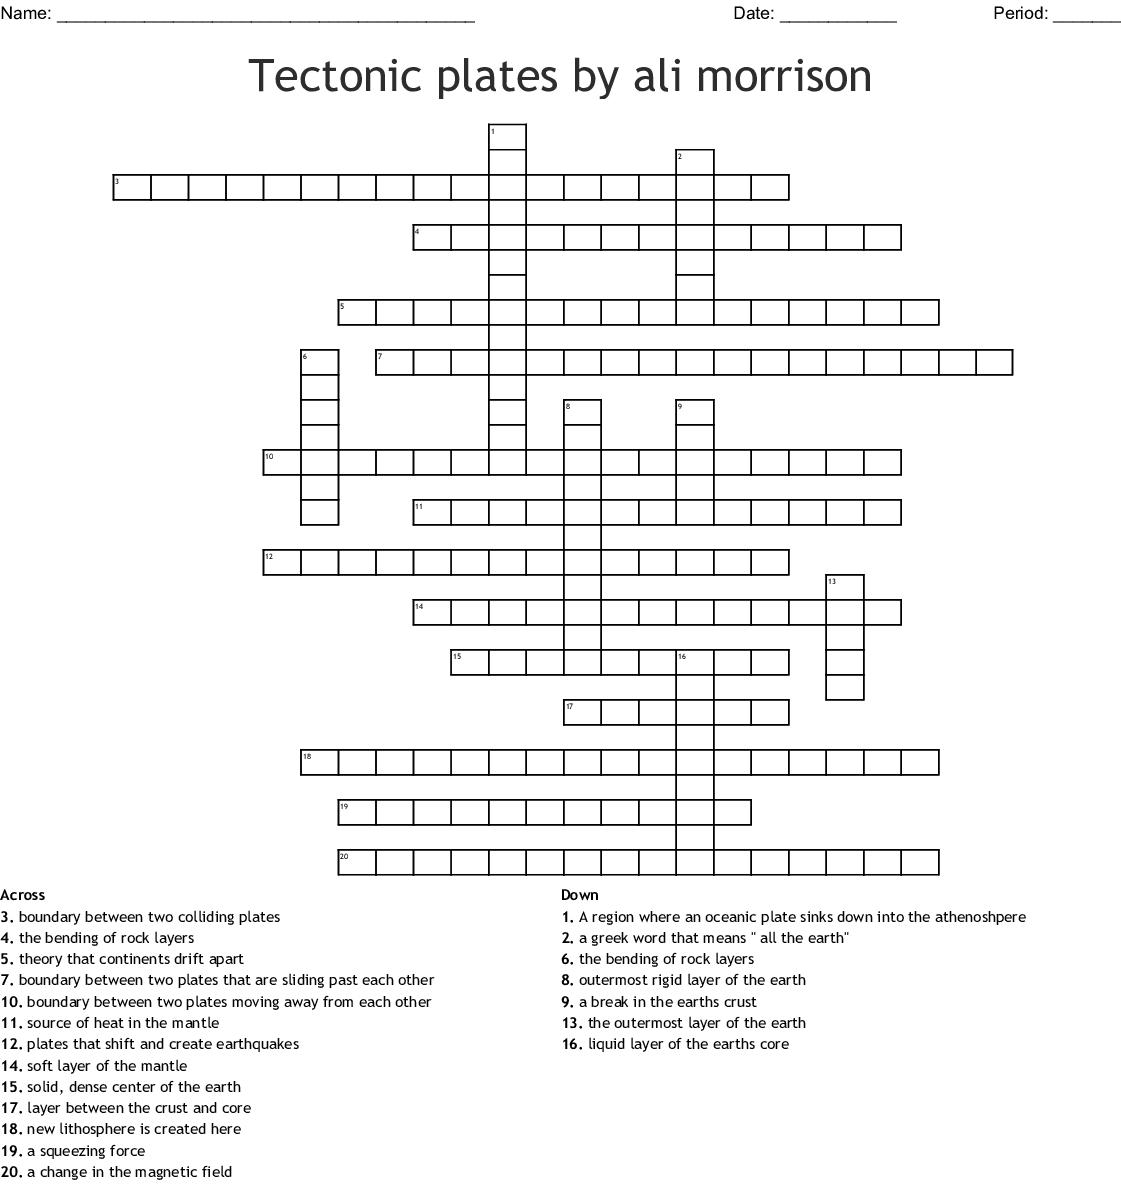 Tectonic Plates By Ali Morrison Crossword